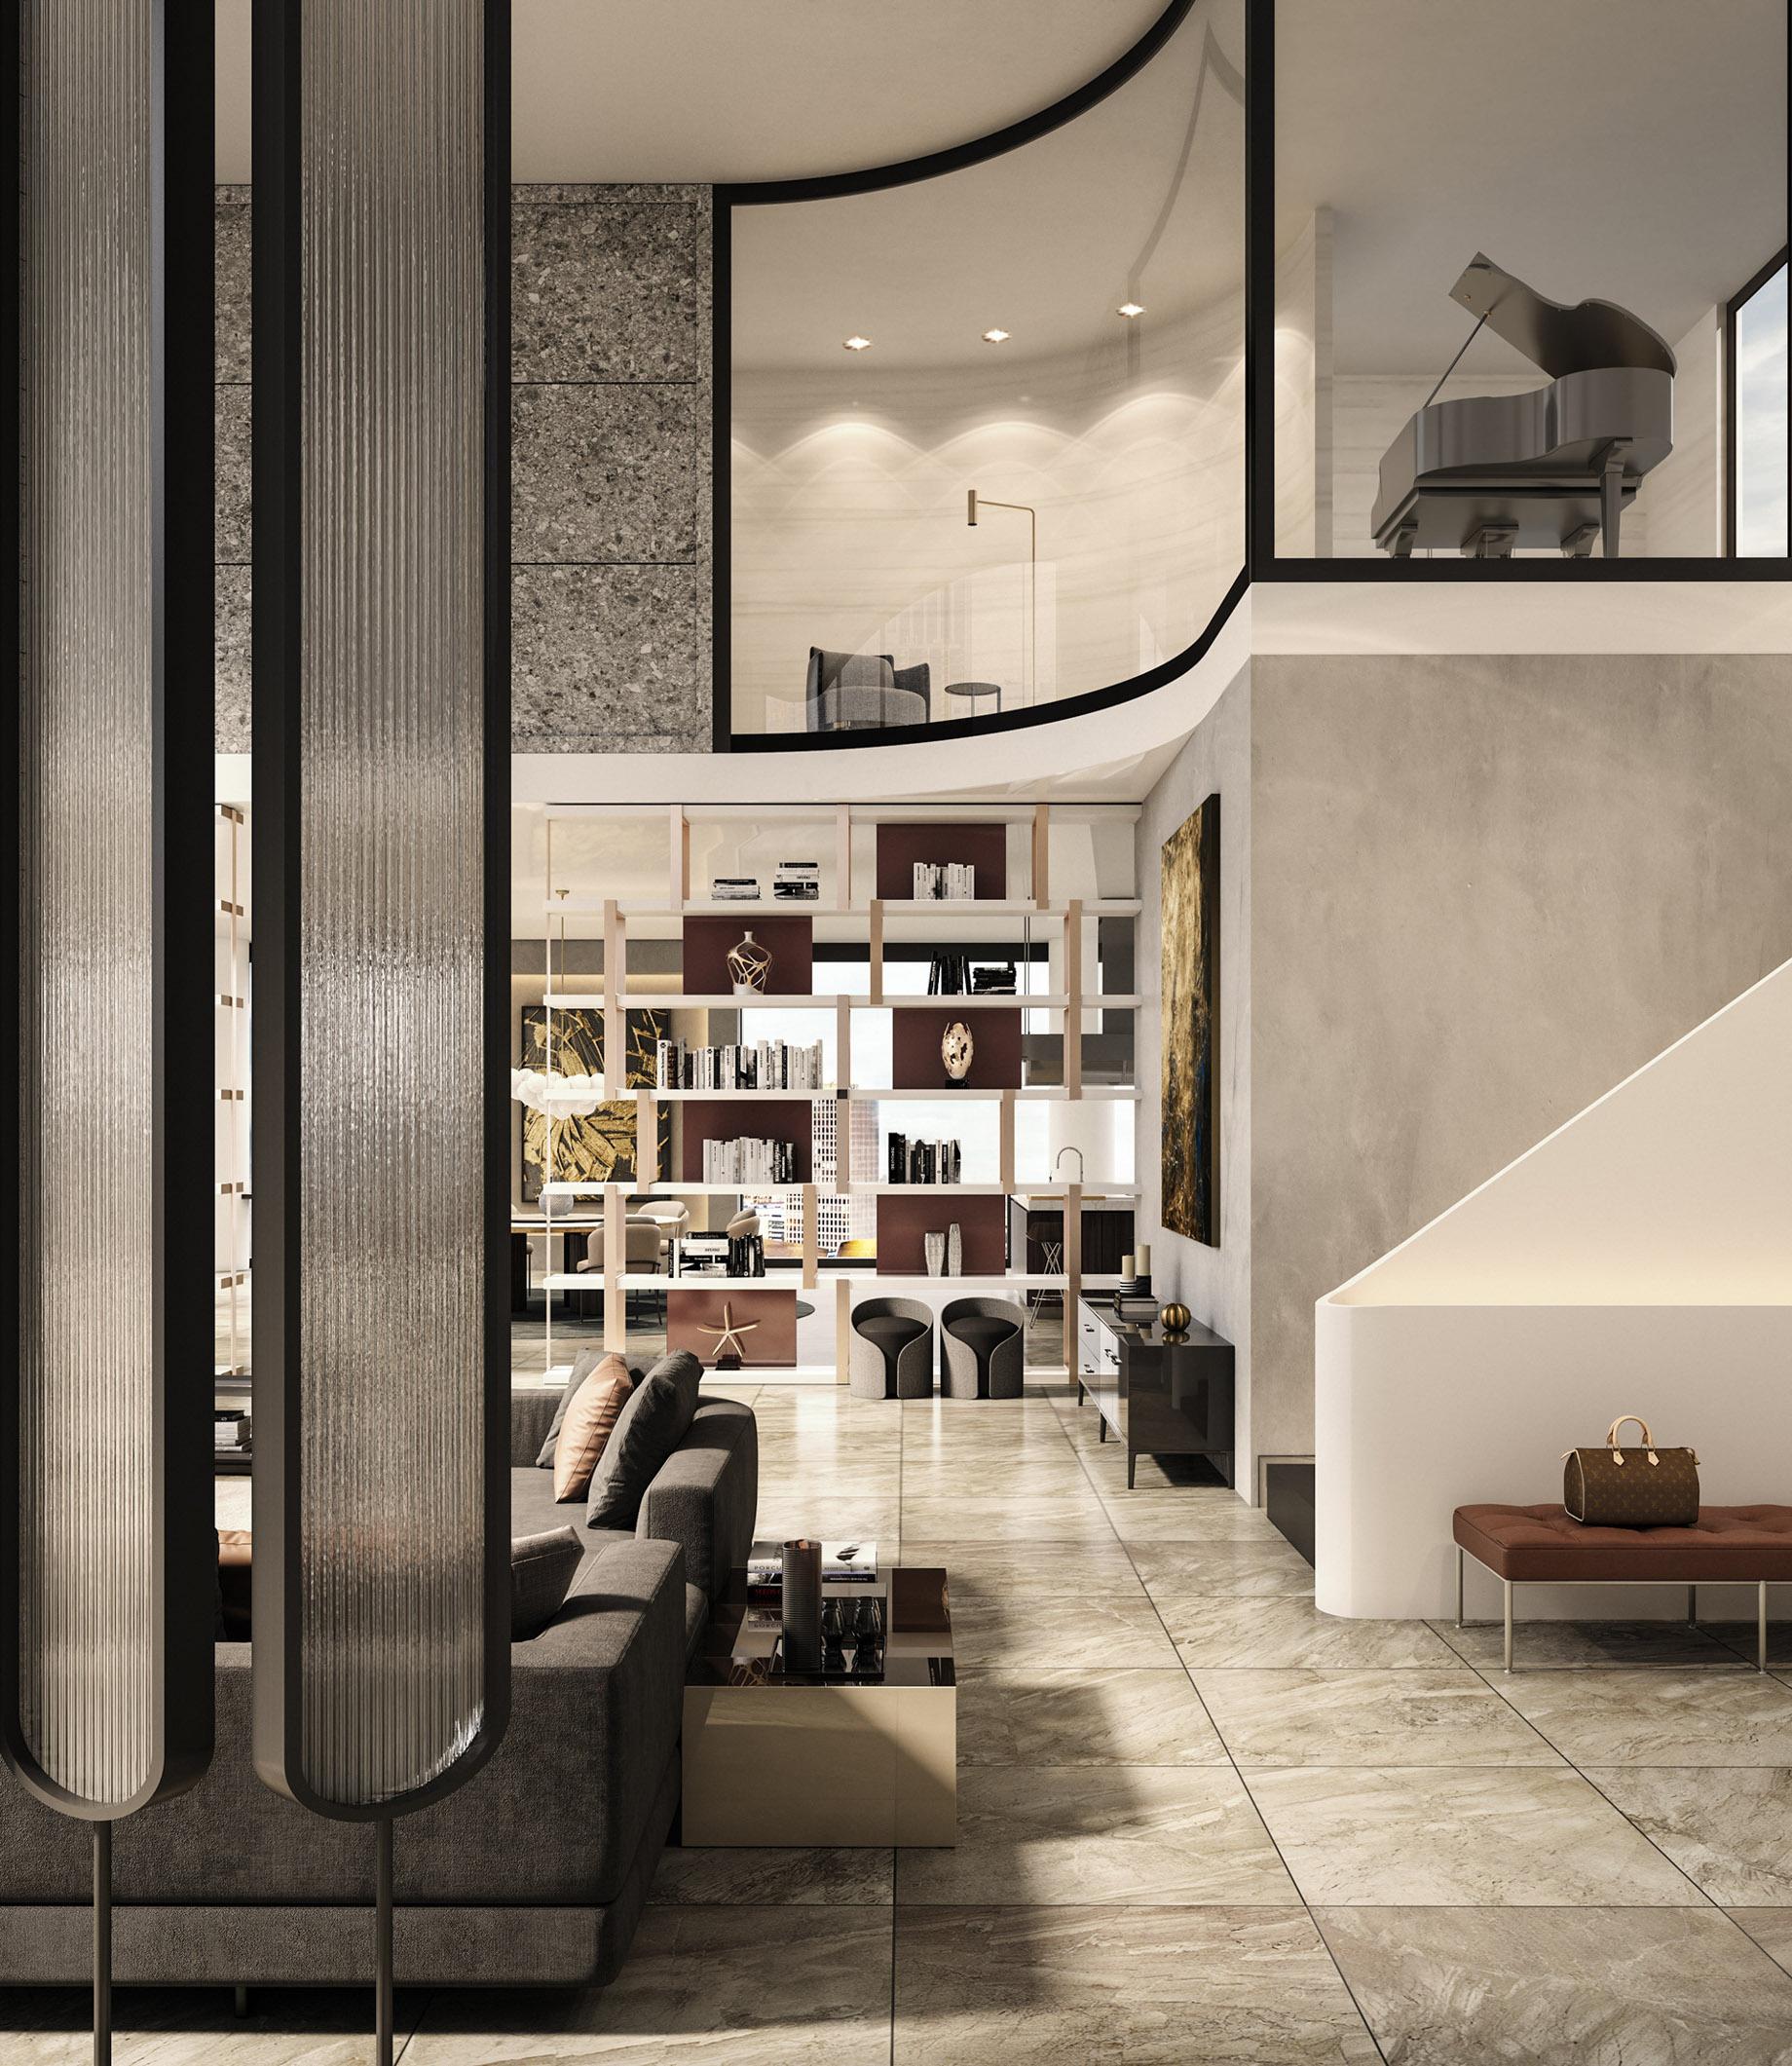 Penthouse Interior Design Los Angeles, CA, USA – Georgios Tataridis